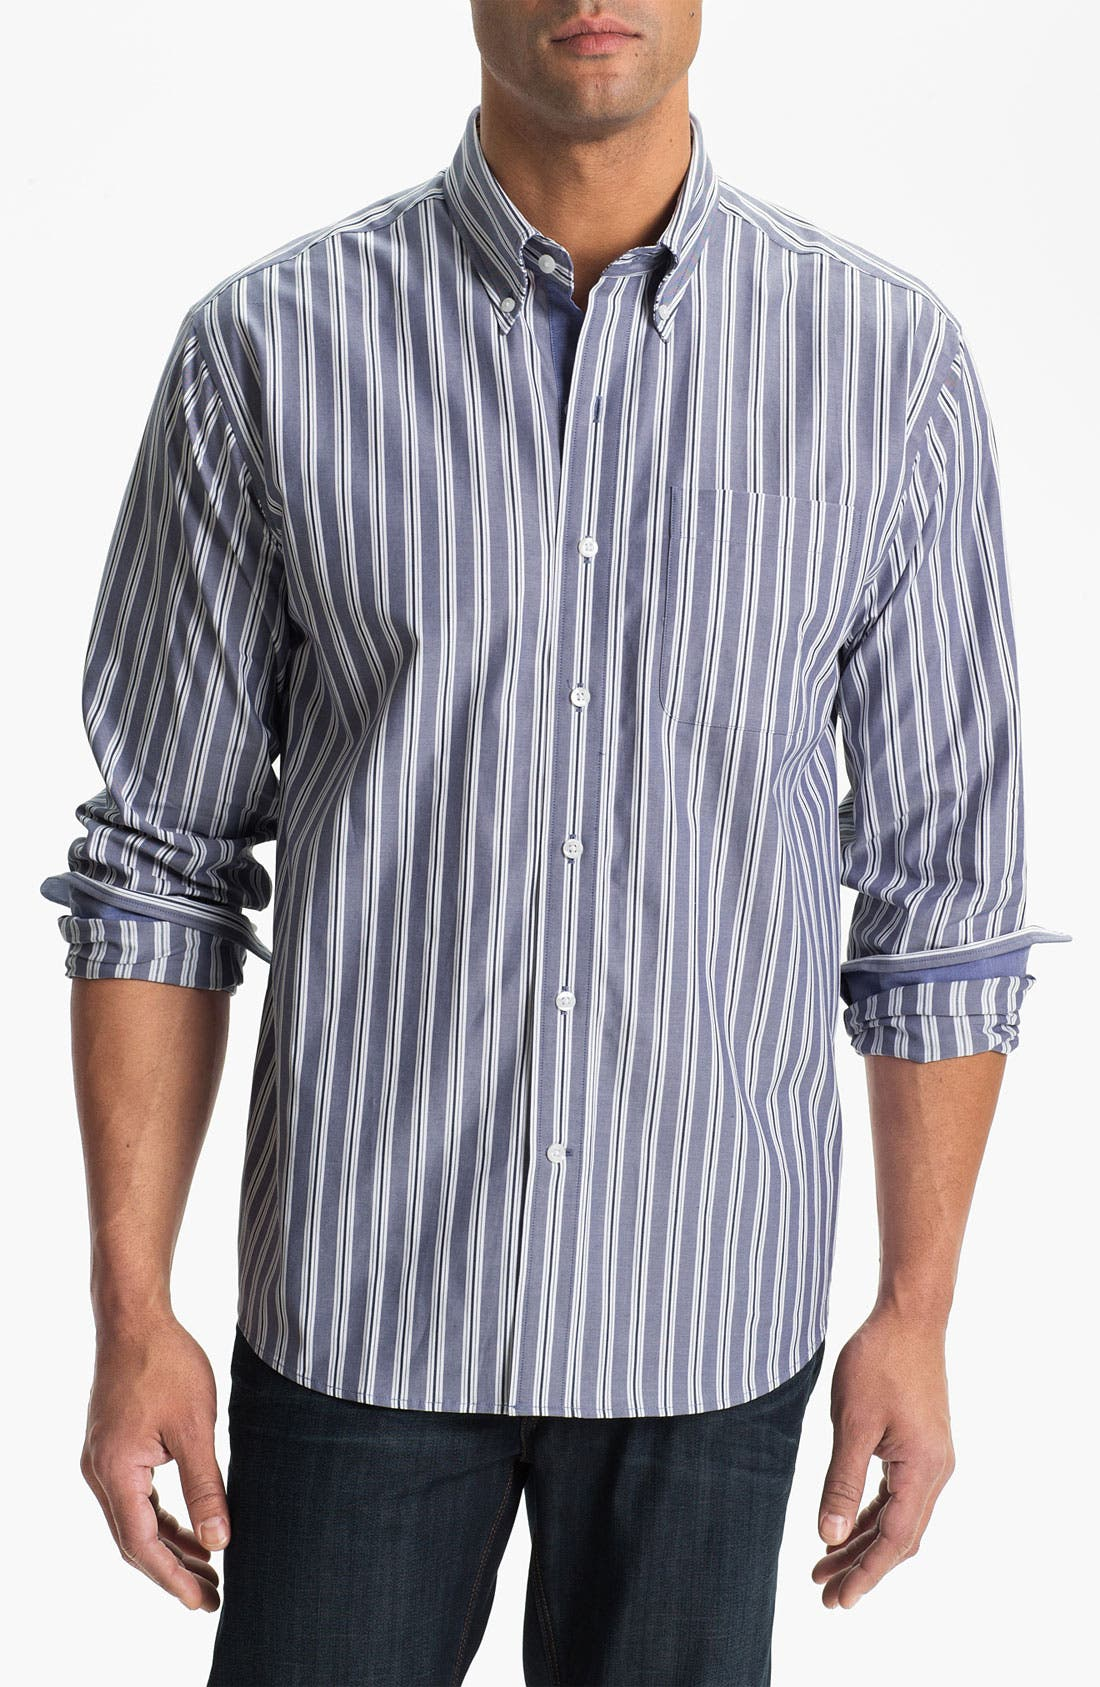 Alternate Image 1 Selected - Cutter & Buck 'Atherton Stripe' Regular Fit Sport Shirt (Big & Tall)